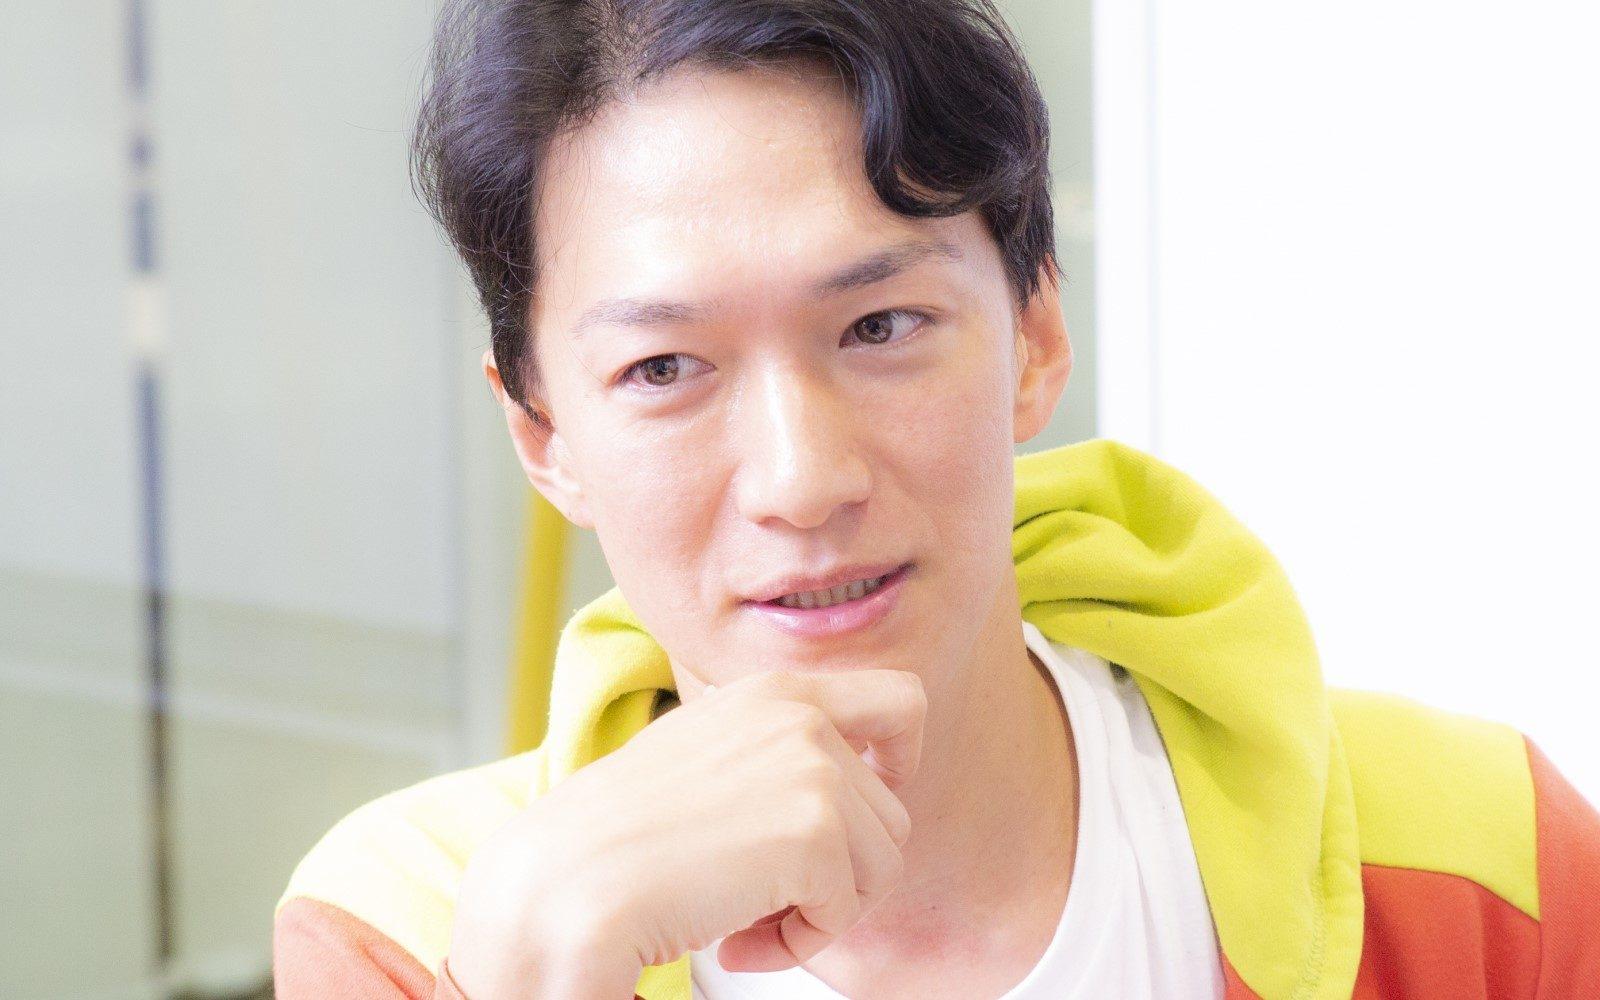 DApp market pioneer: Good Luck 3 Inc. CEO Kazuhisa Inoue #02 – Putting all types of entertainment on the blockchain